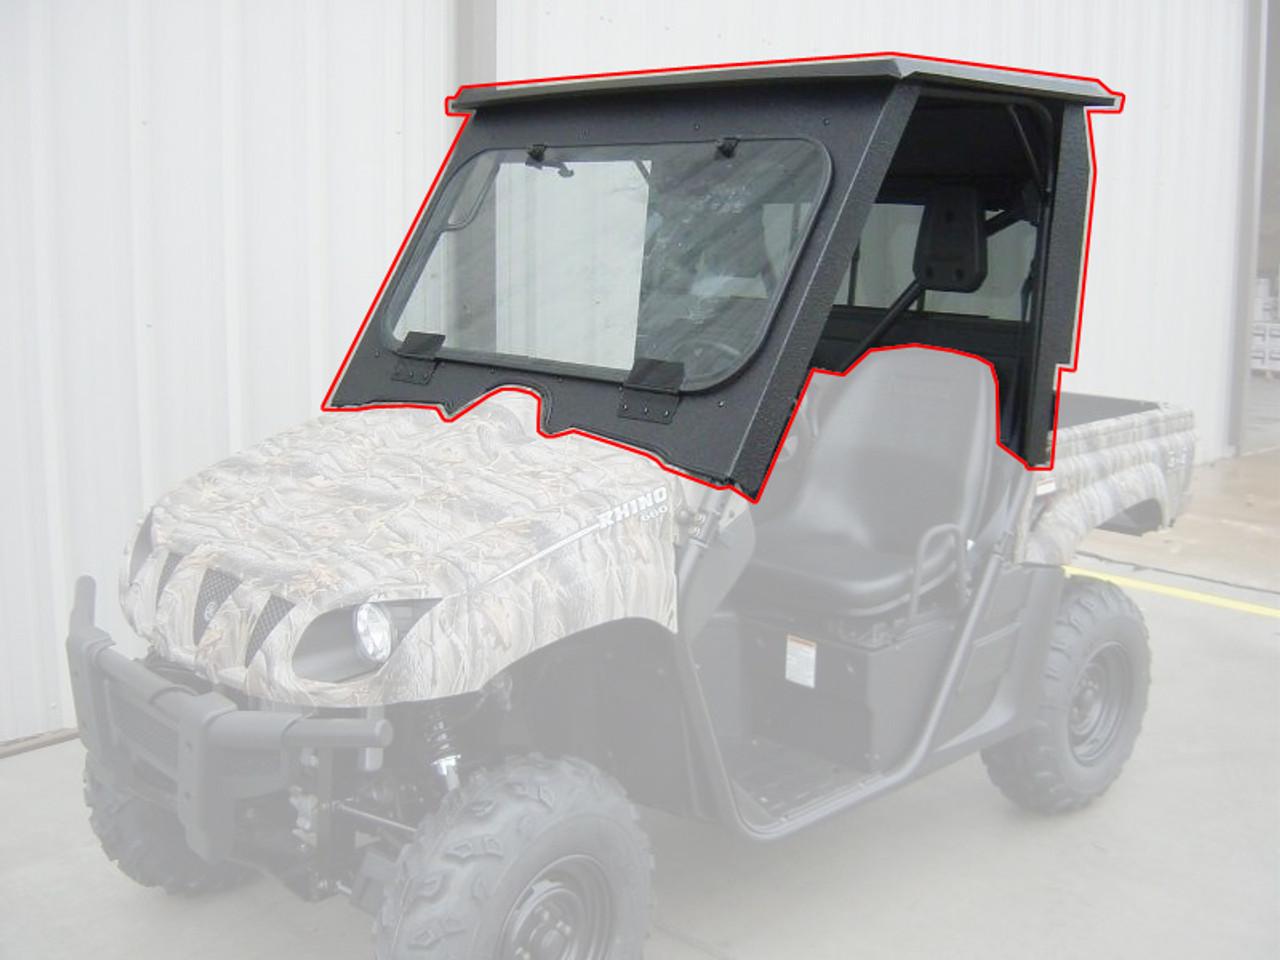 All Steel Complete Cab Enclosure System No Doors Yamaha Rhino 660 700 2007 2013